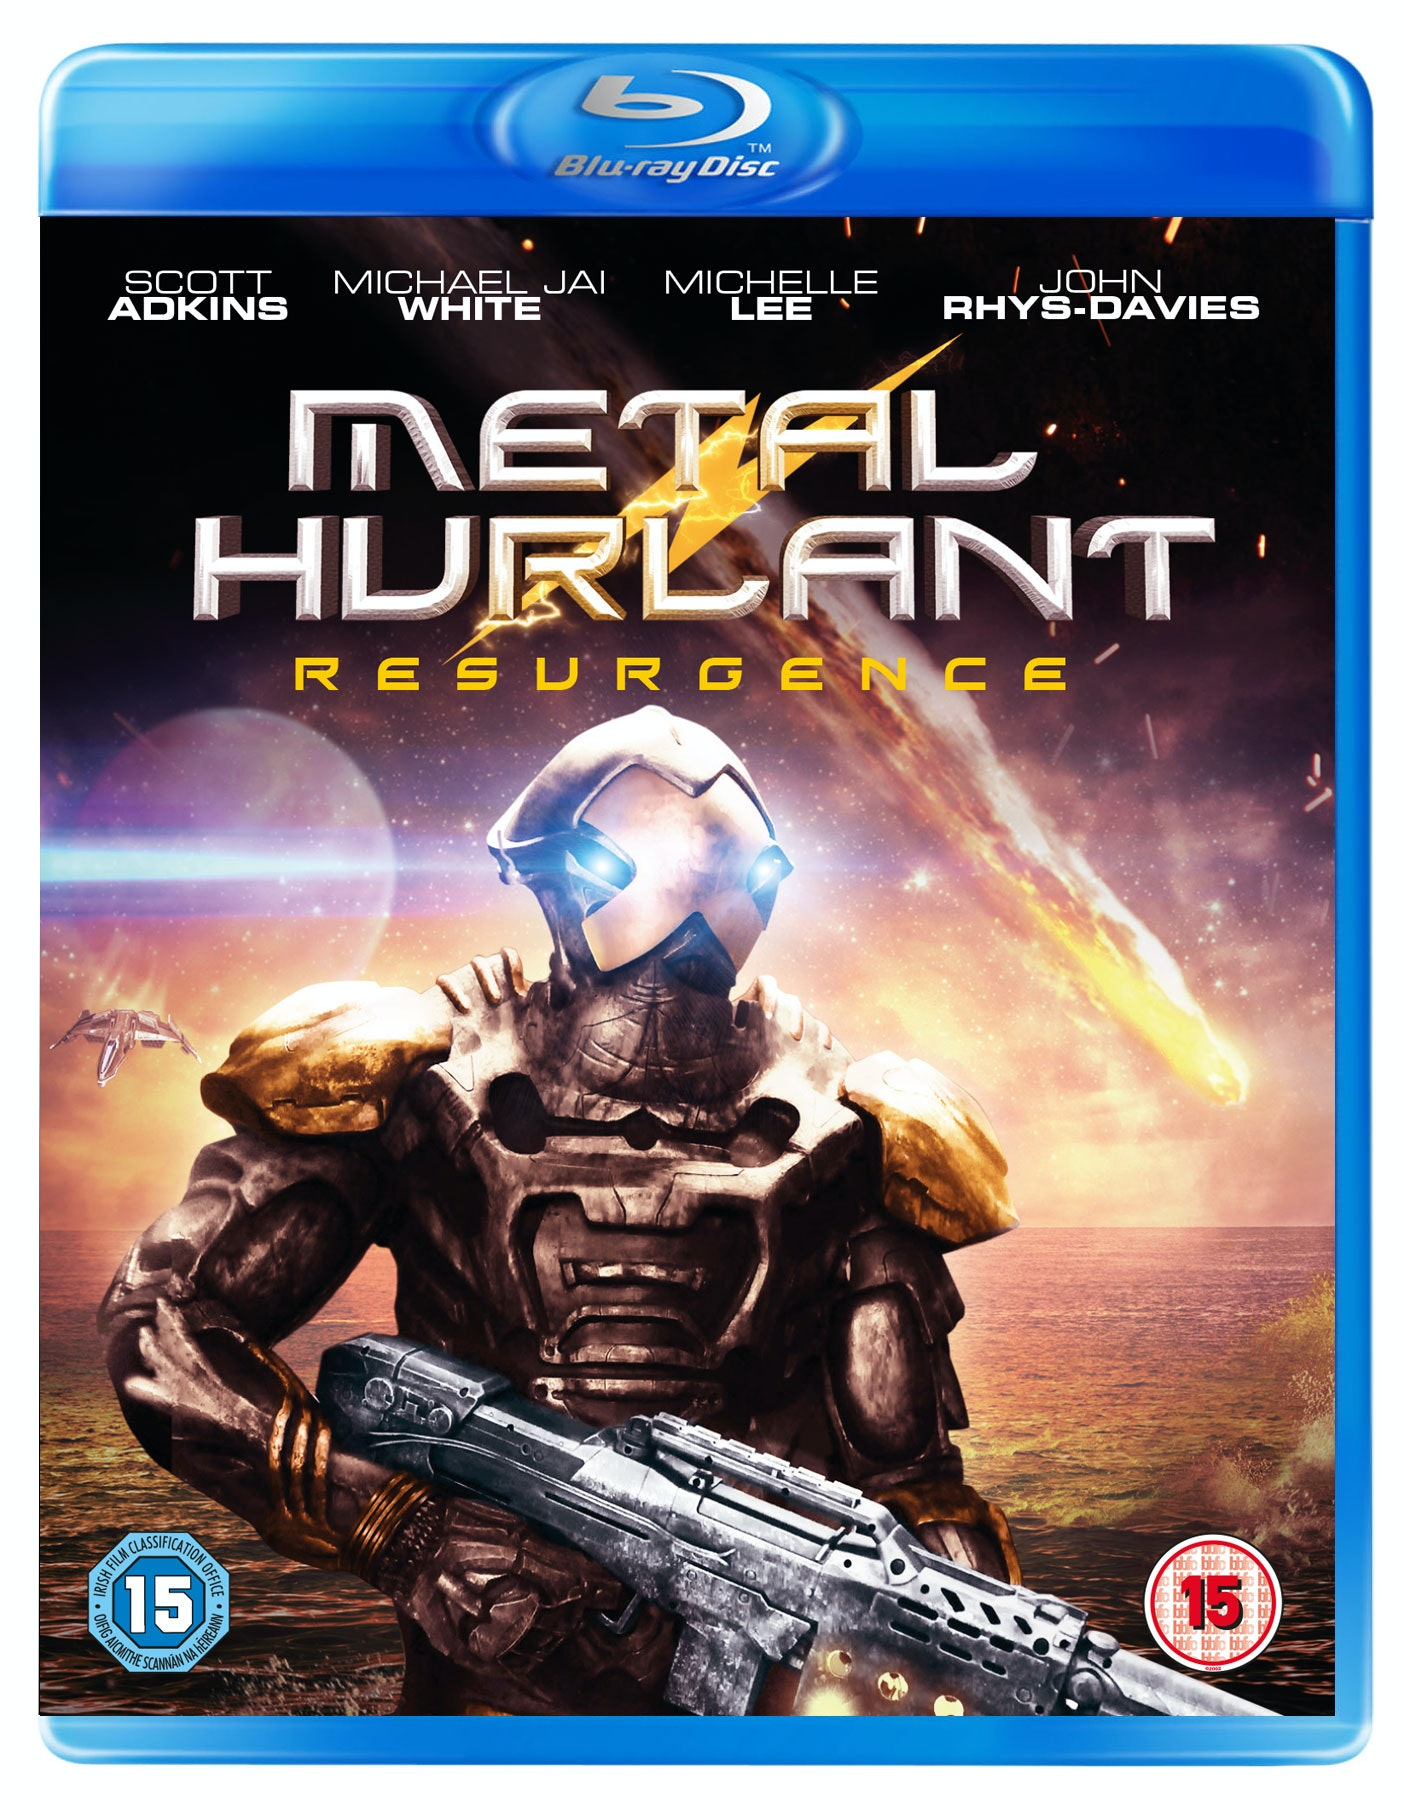 Metal Hurlant: Resurgence Blu-ray sweepstakes